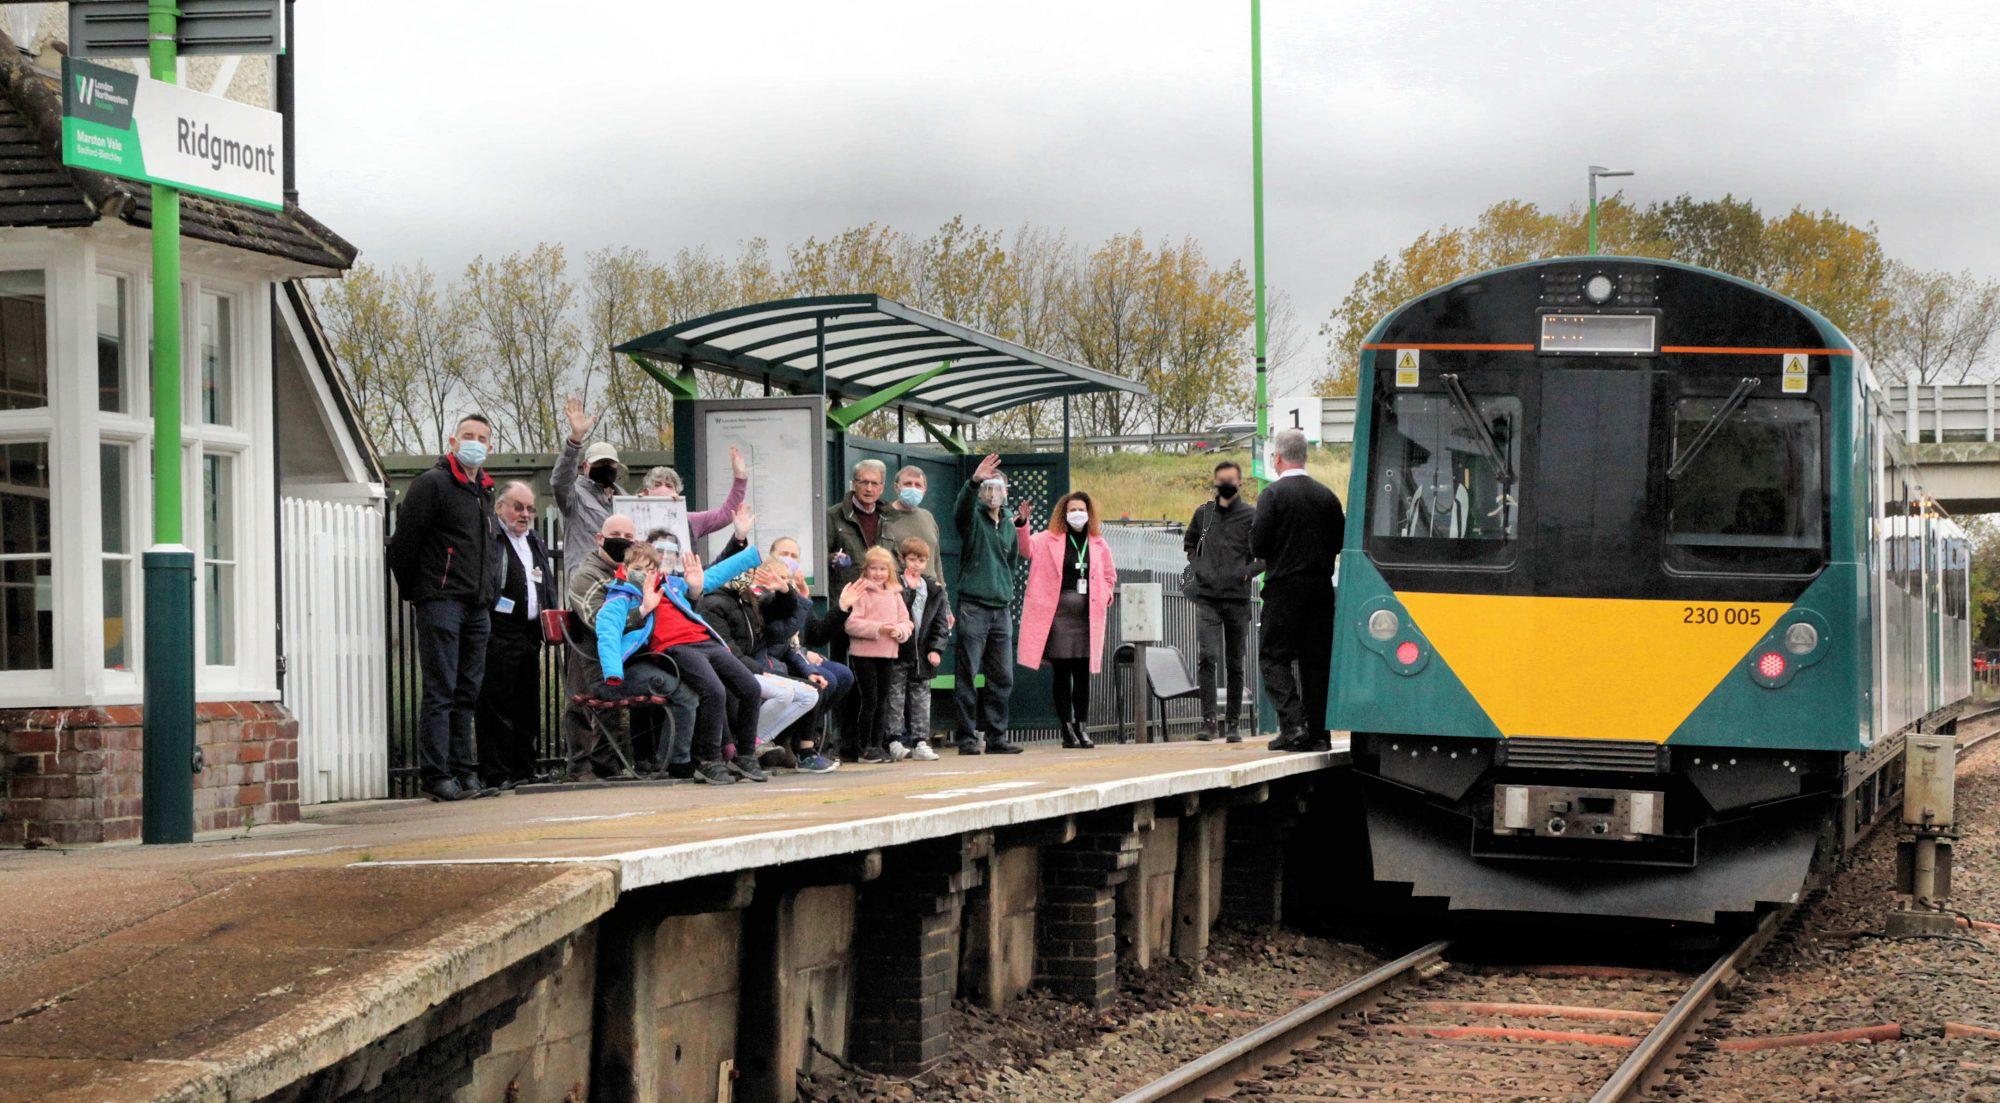 Passengers at station platform with train